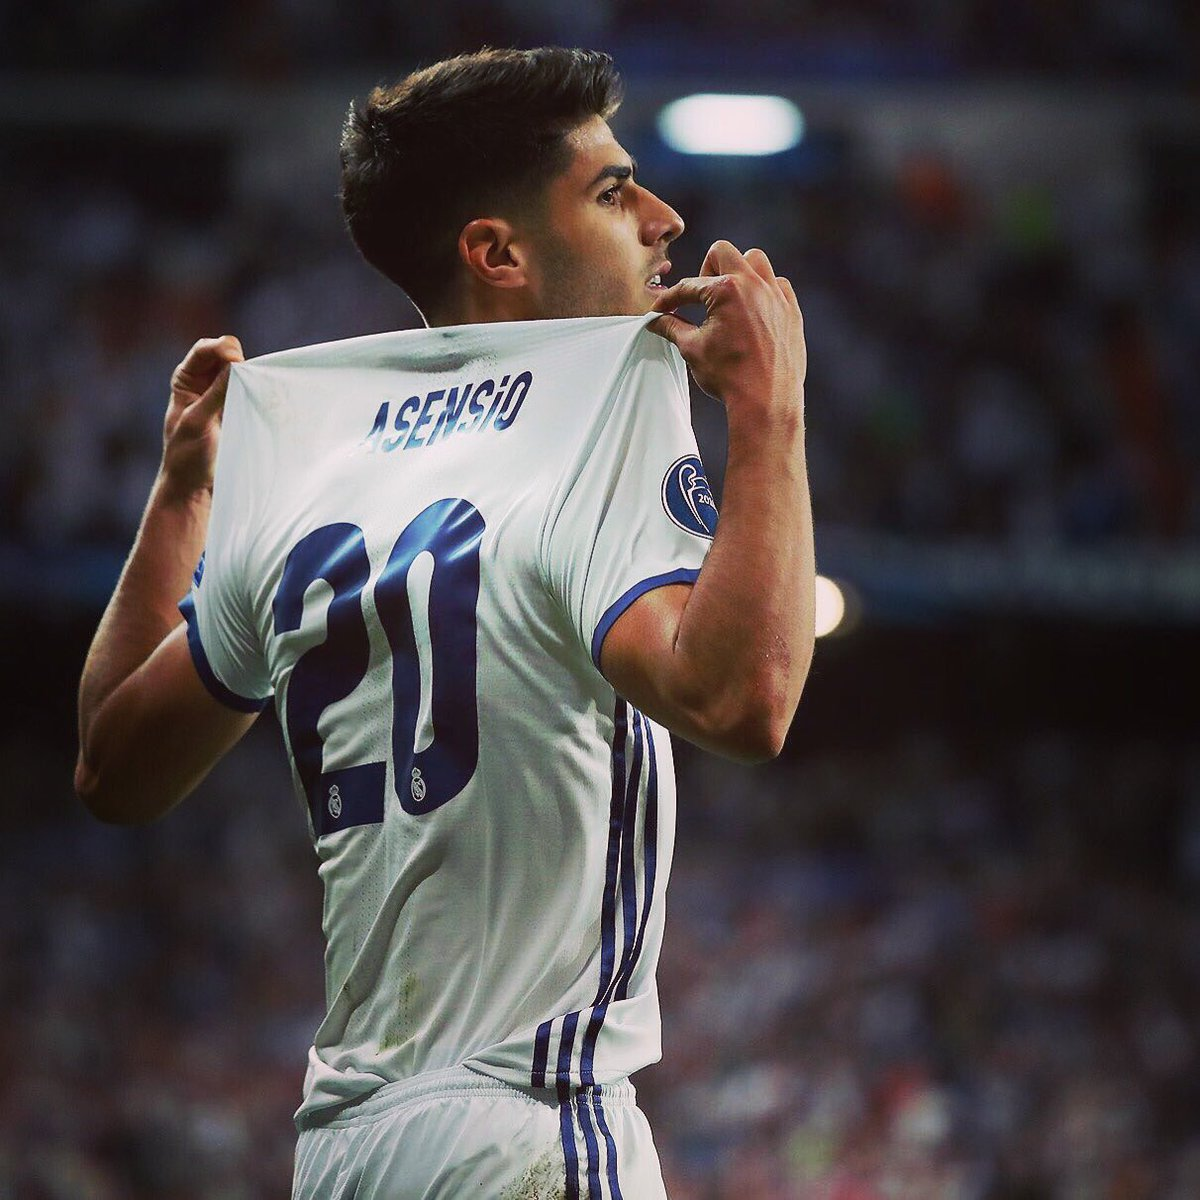 Marco Asensio On Twitter Noche Mágica En El Bernabéu